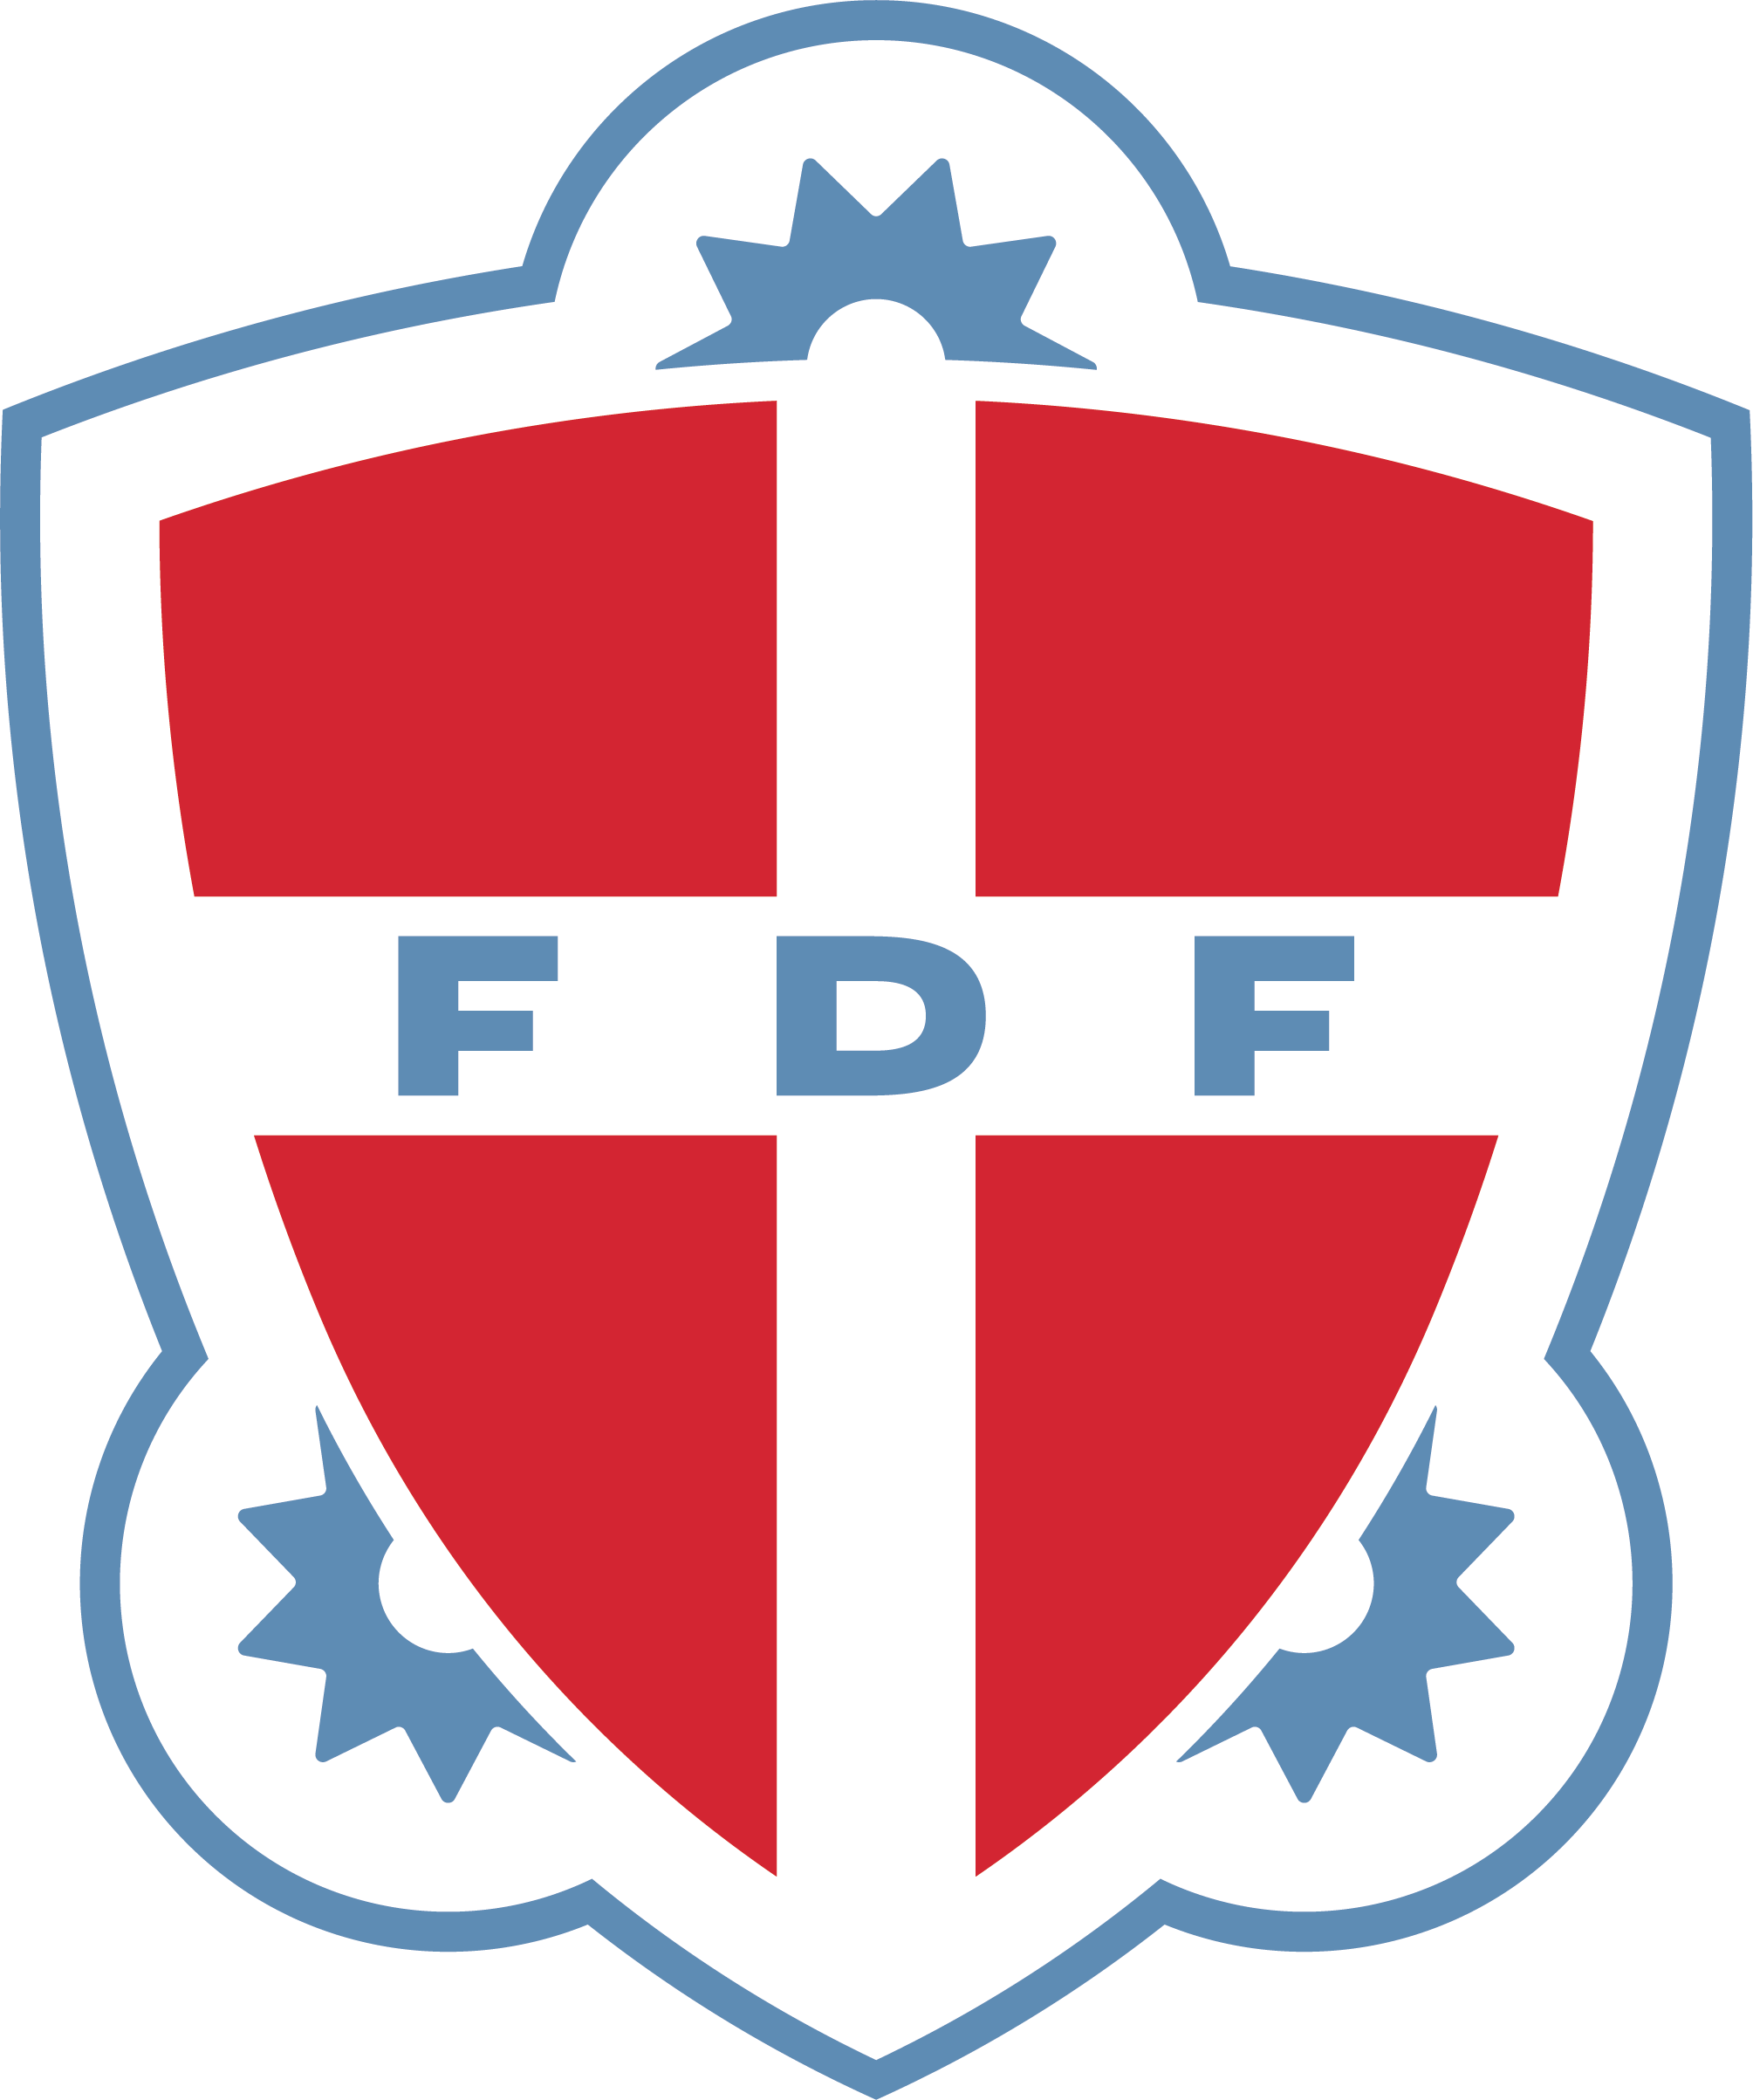 FDF Svanninge-Faaborg